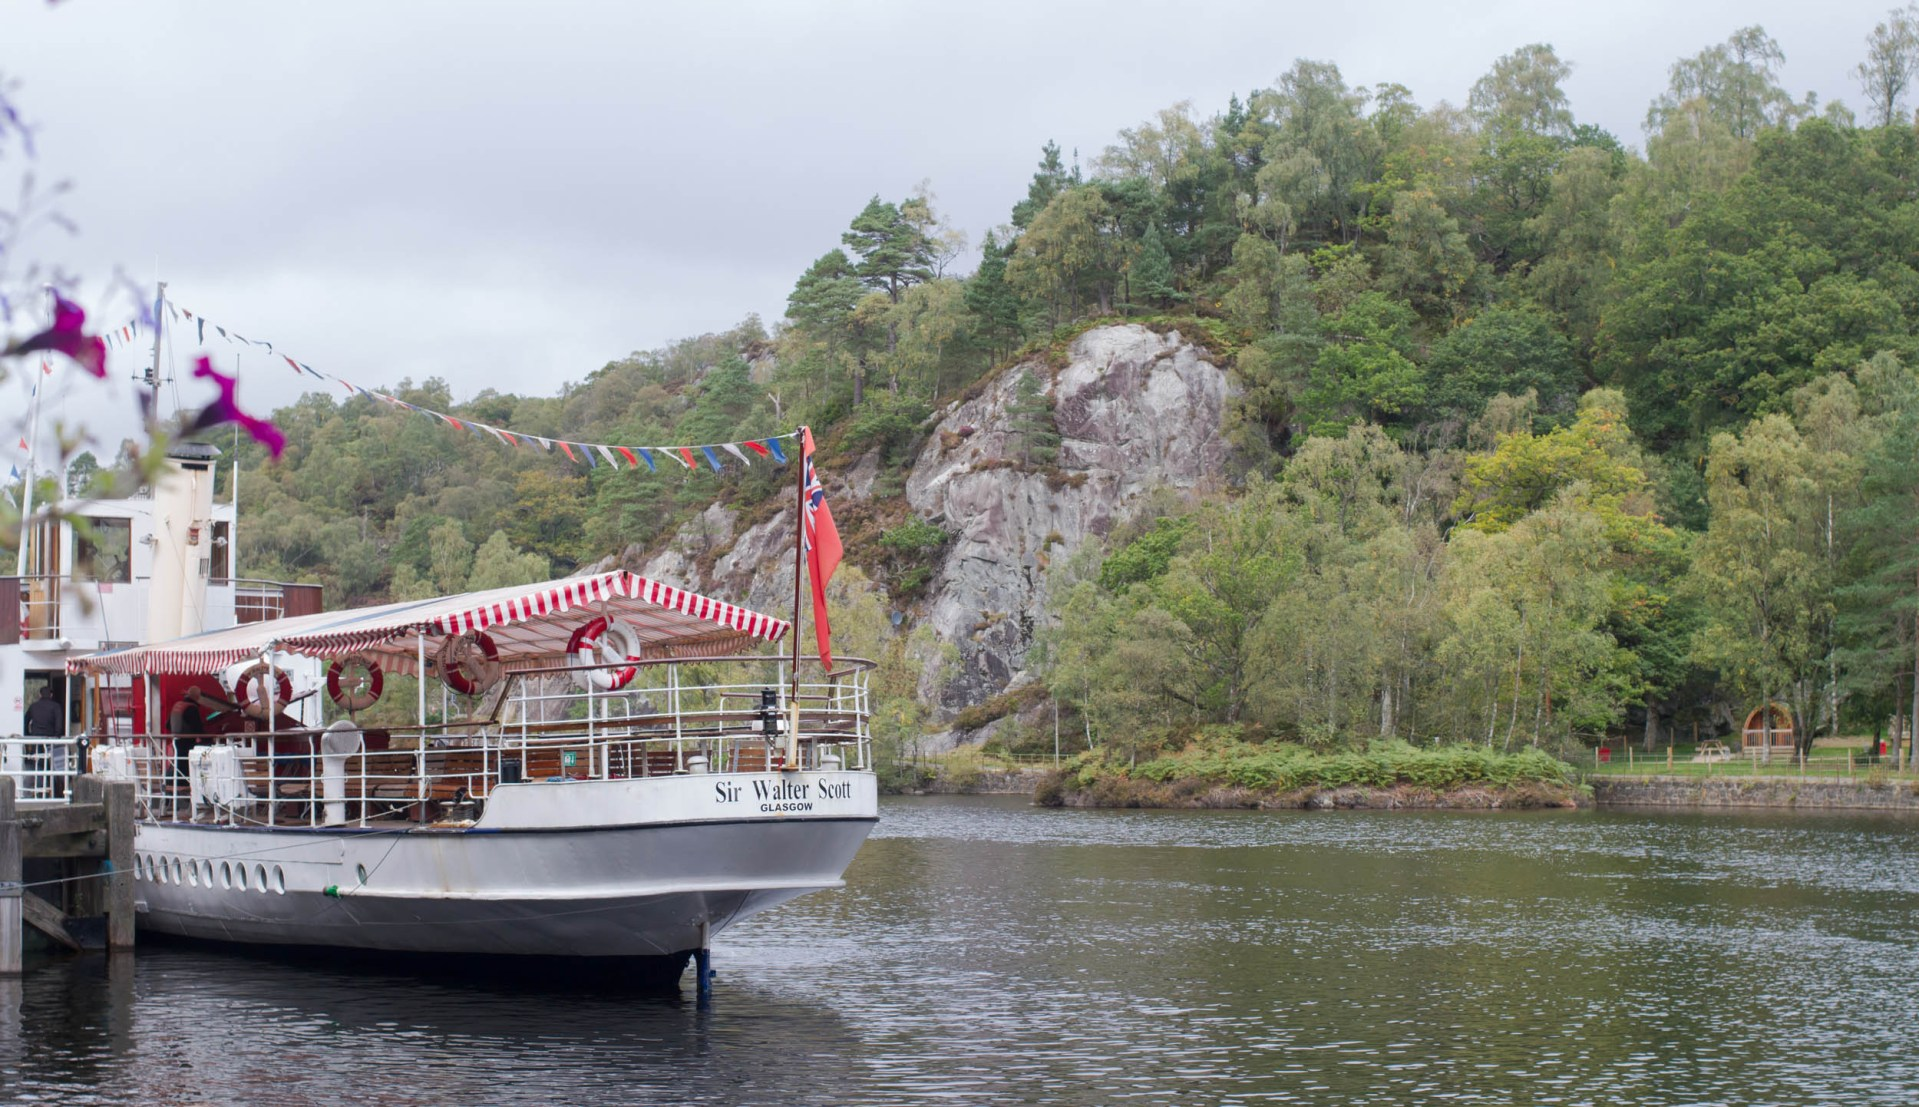 Sir Walter Scott steam boat, Loch Katrine